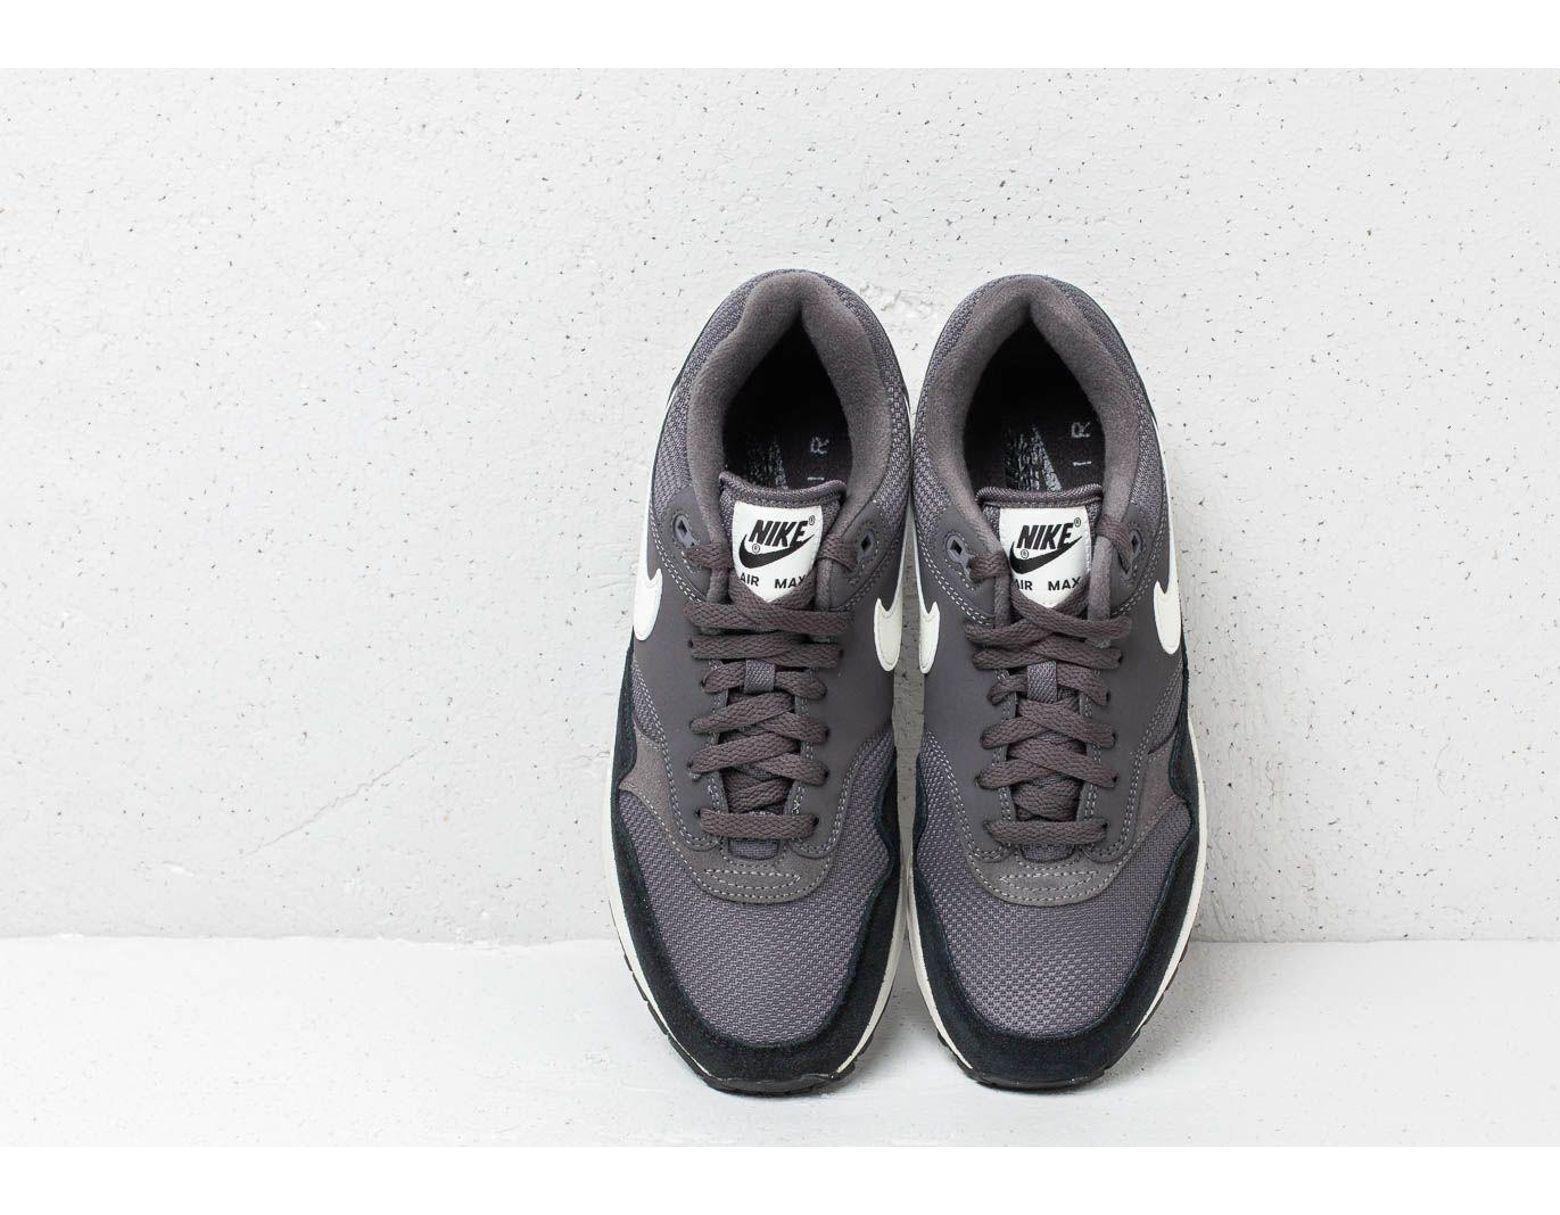 half off 1429e c089c Nike Air Max 1 Thunder Grey  Sail-sail-black in Gray for Men - Lyst